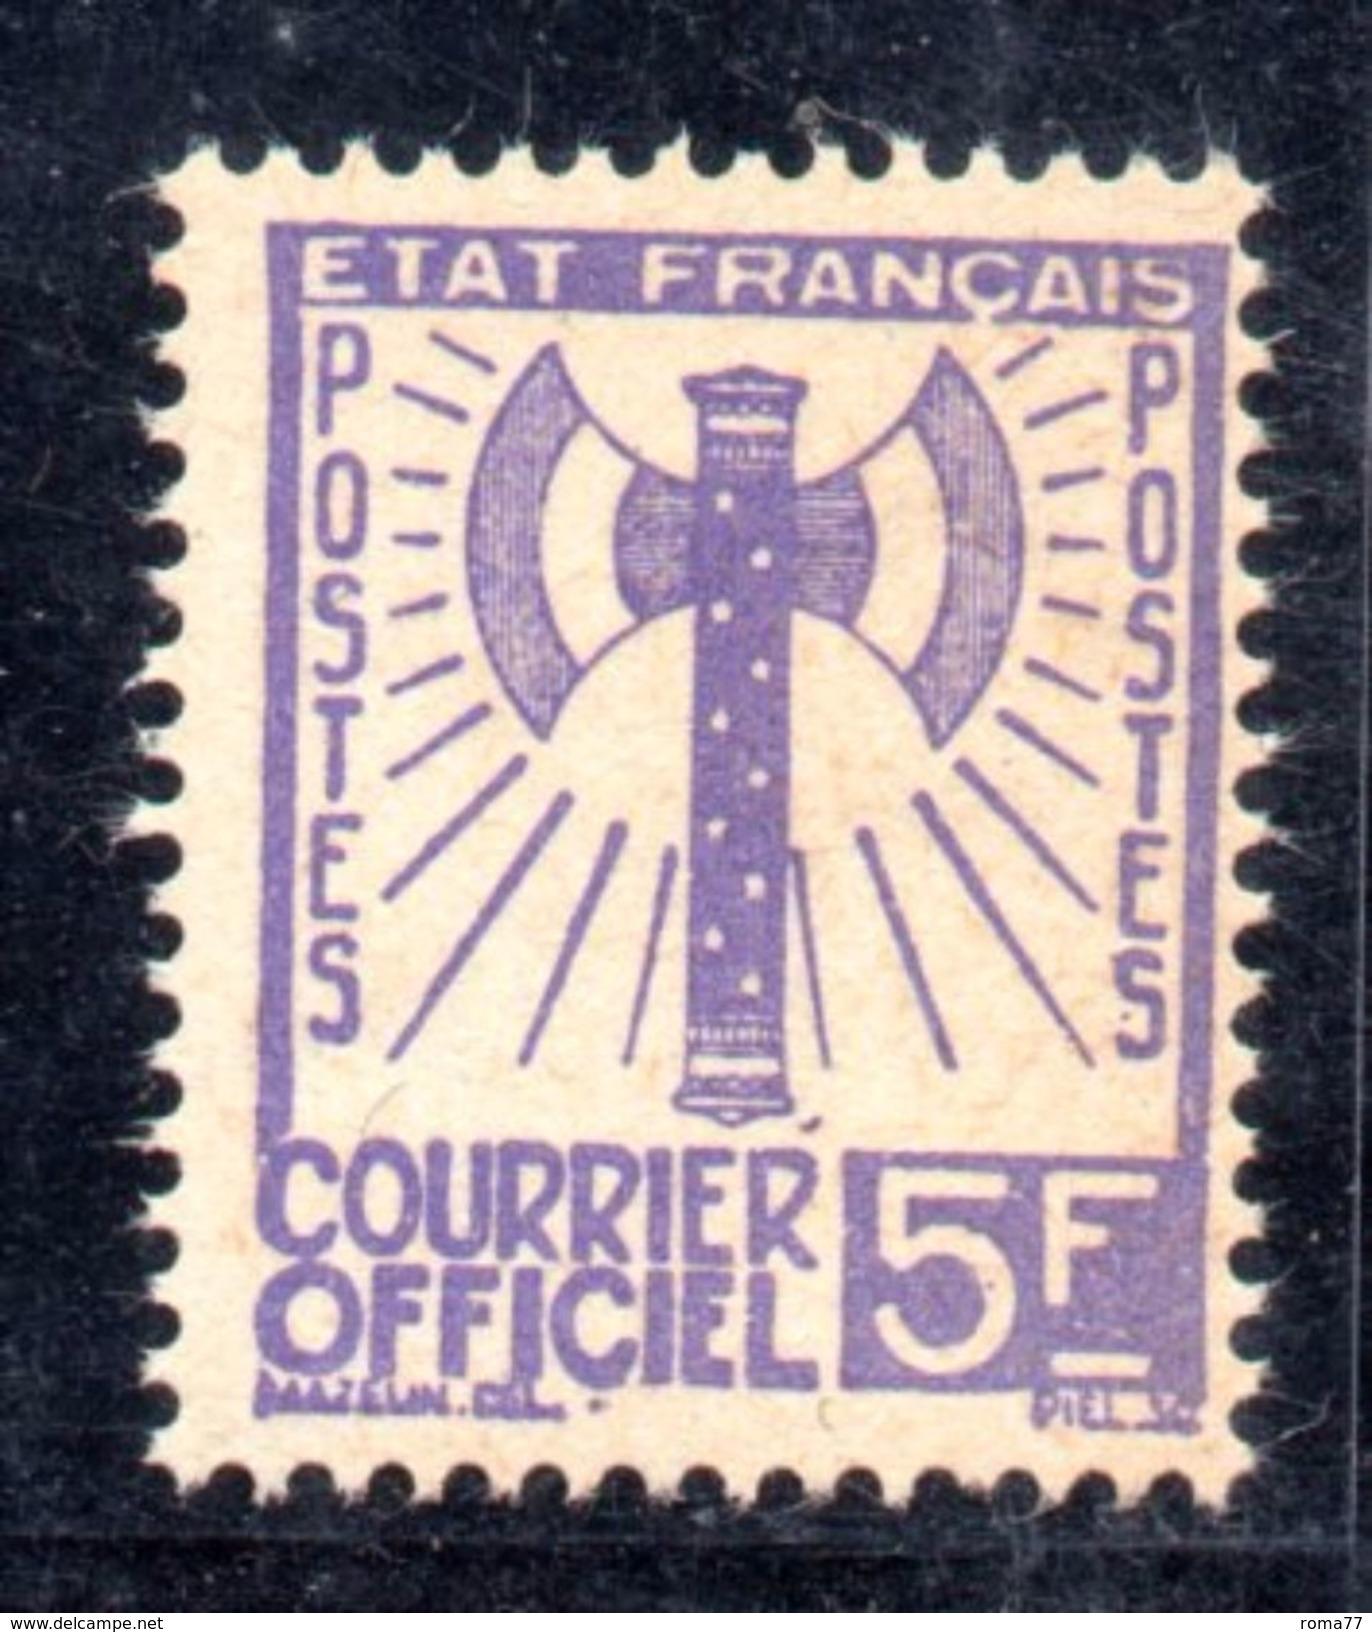 XP1583 - FRANCE Francia - 1943 - COURRIER OFFICIEL, Yvert  11 , 5 Franc *** MNH . - Nuovi